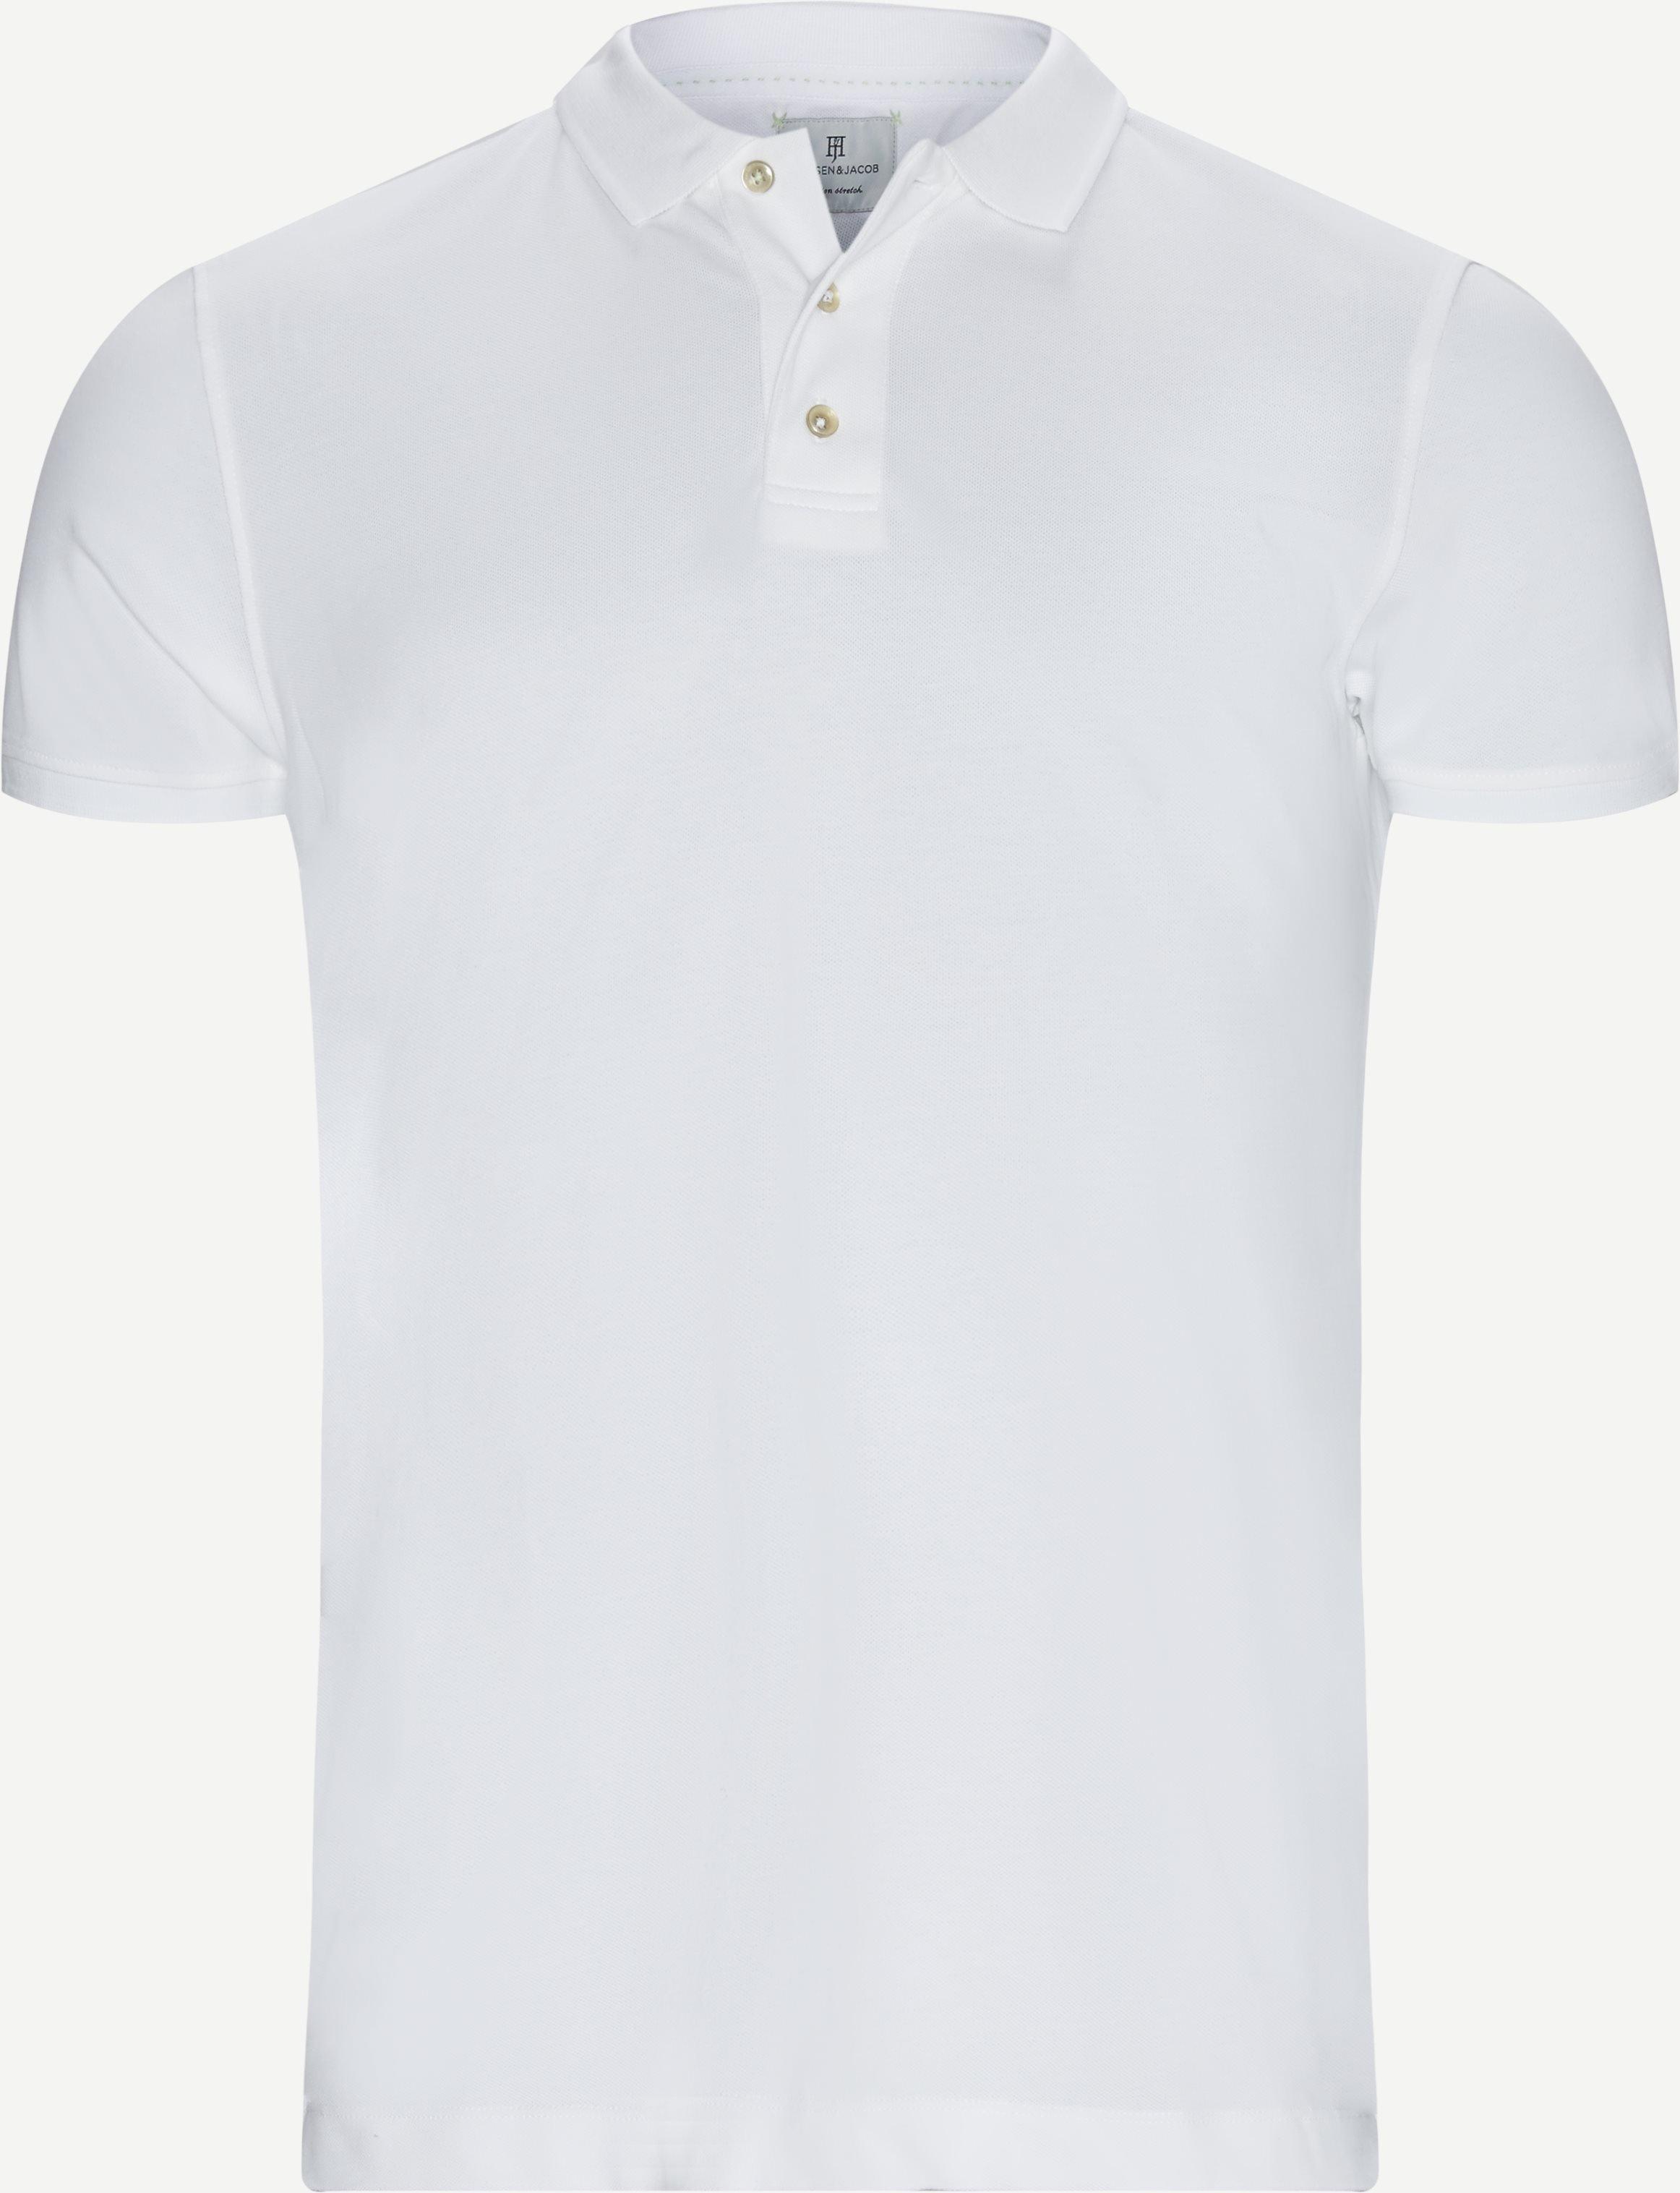 T-shirts - Modern fit - White